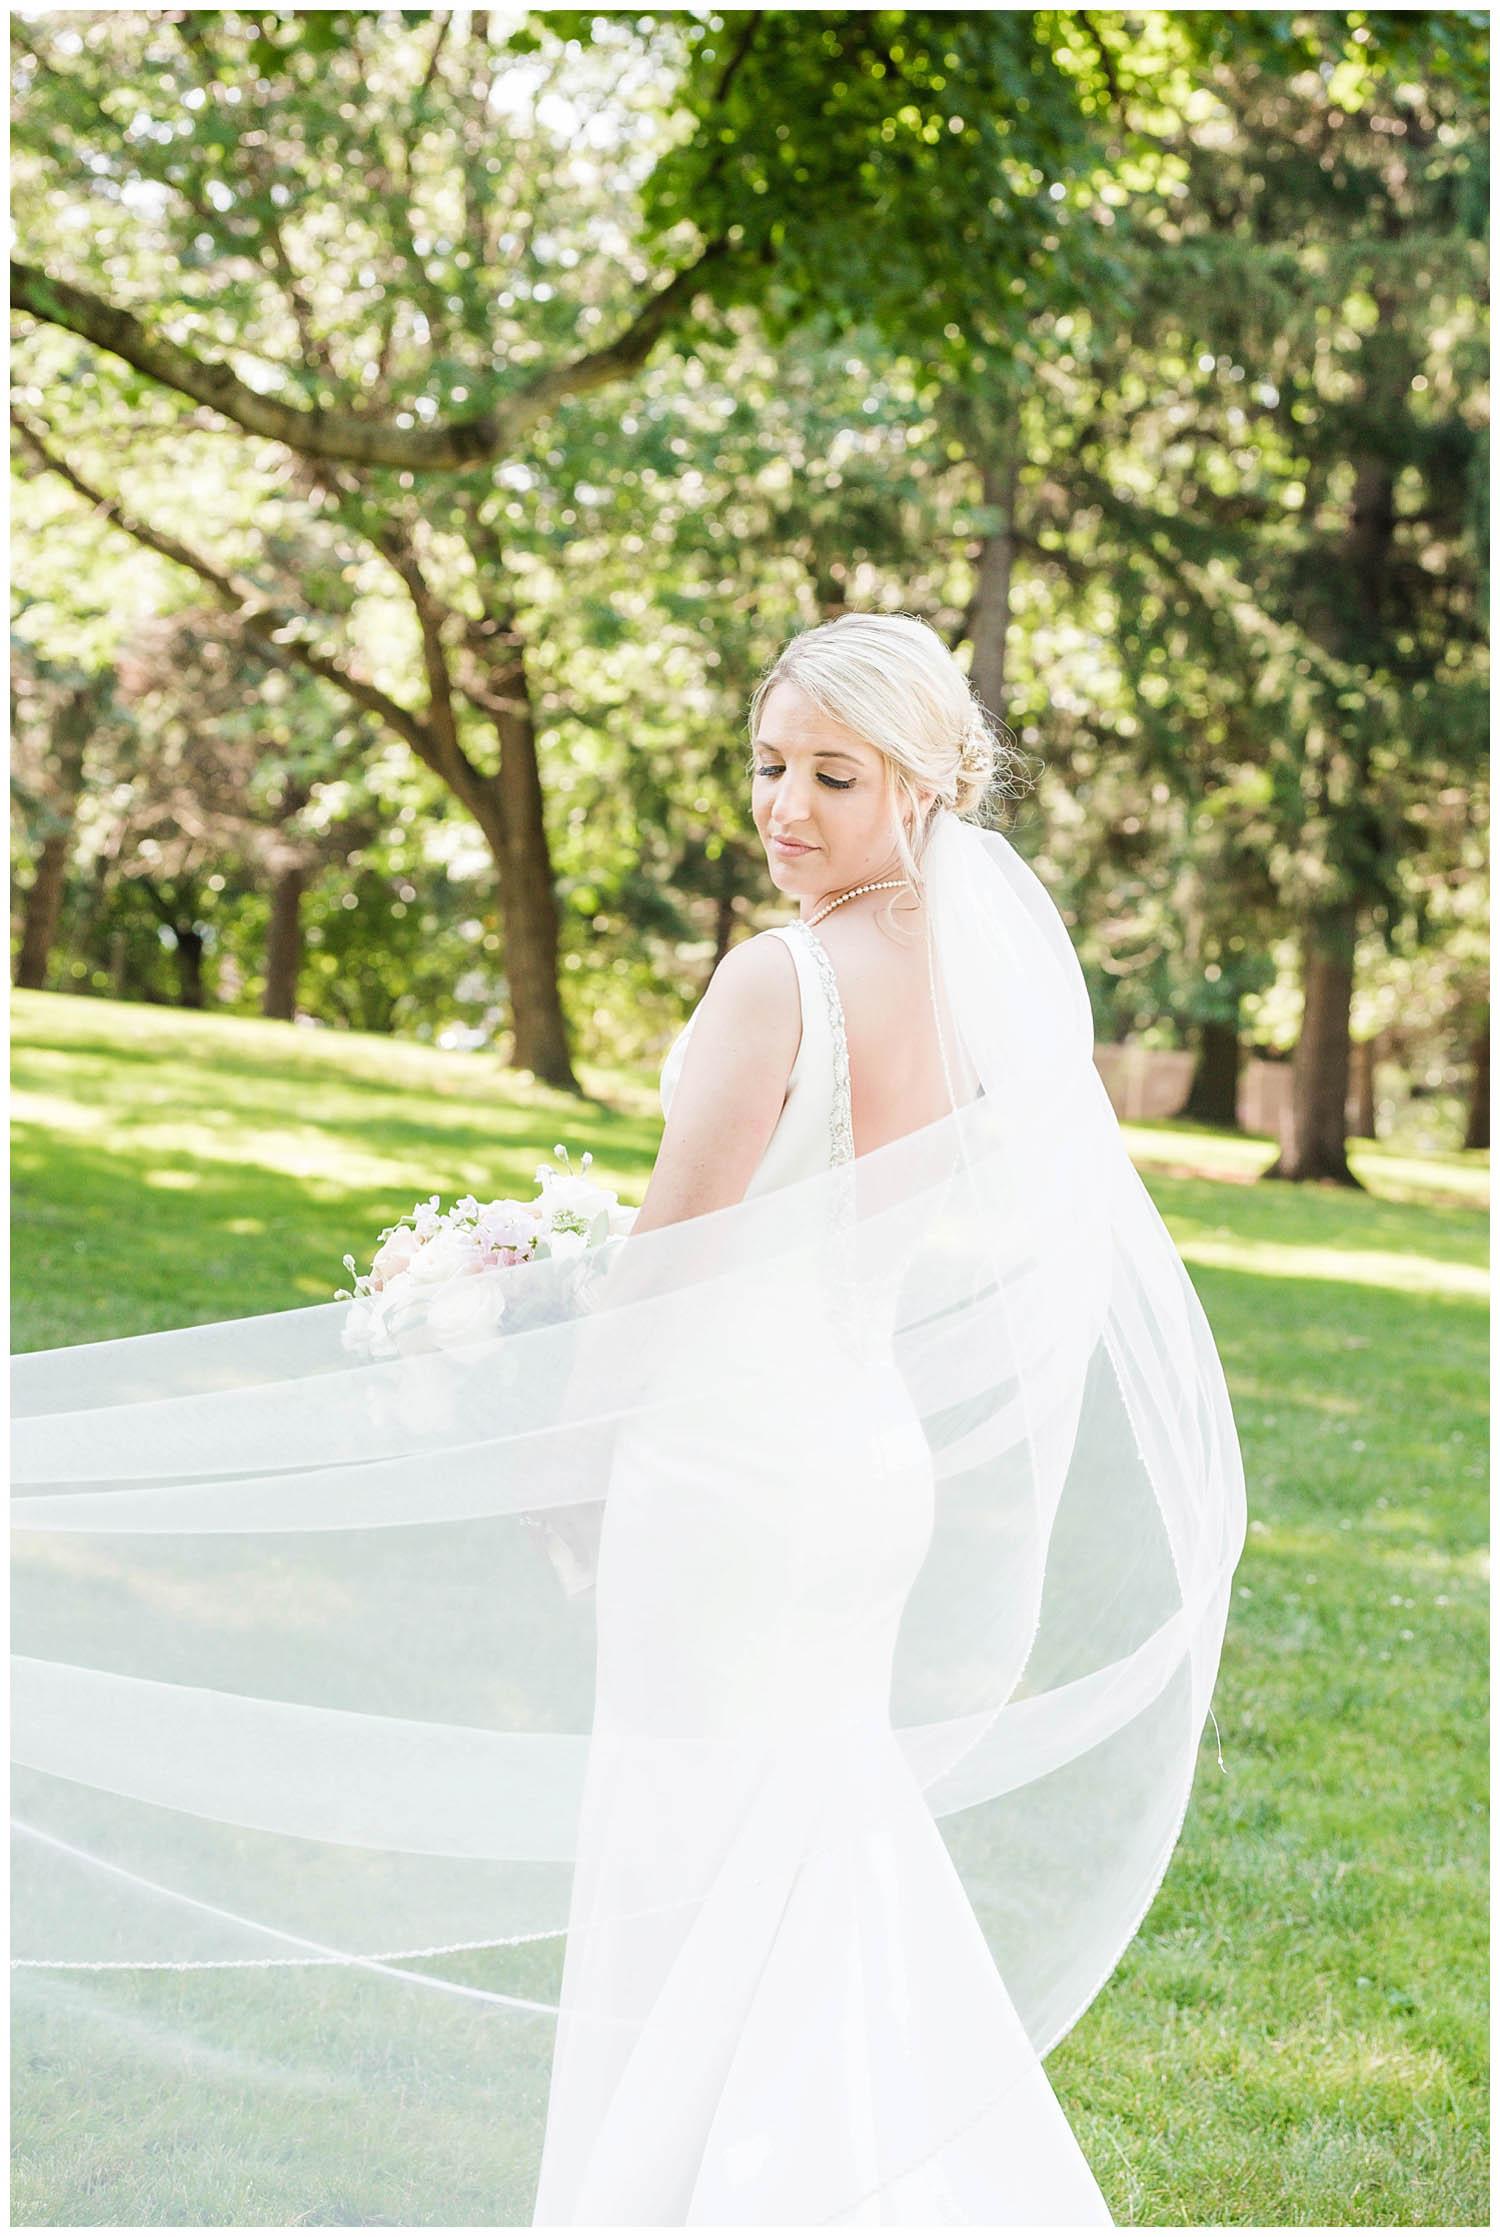 Lackawanna_Radisson_Wedding_045.jpg